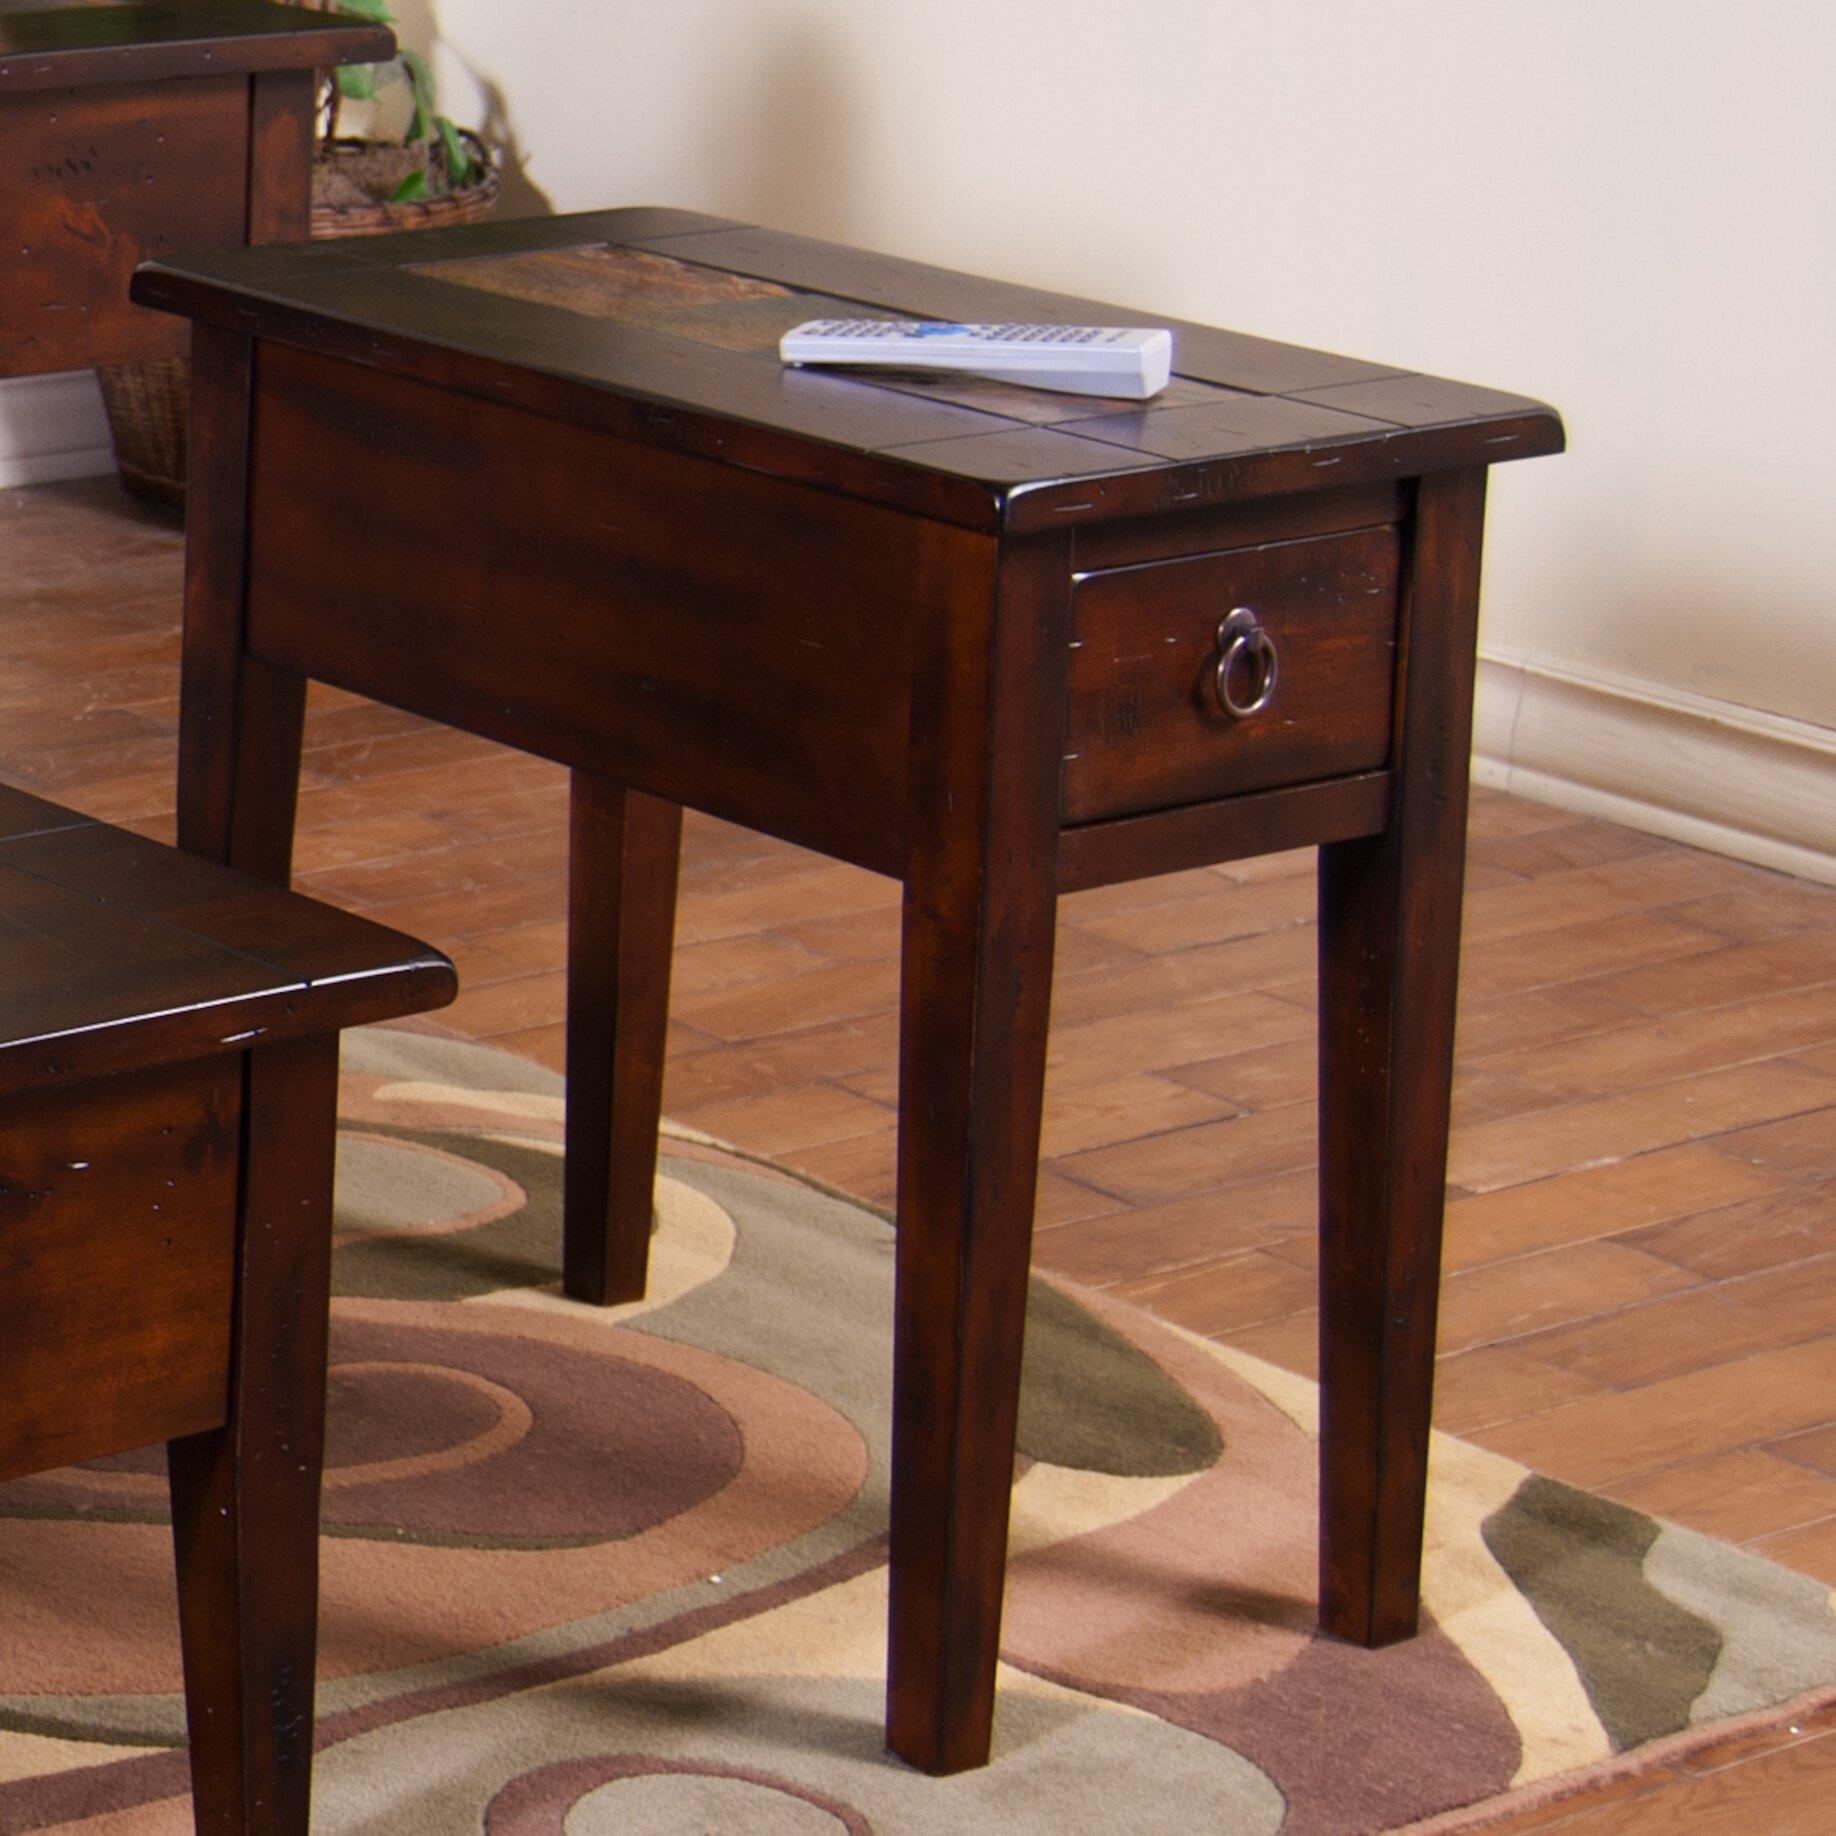 Sunny Designs Santa Fe End Table & Reviews | Wayfair